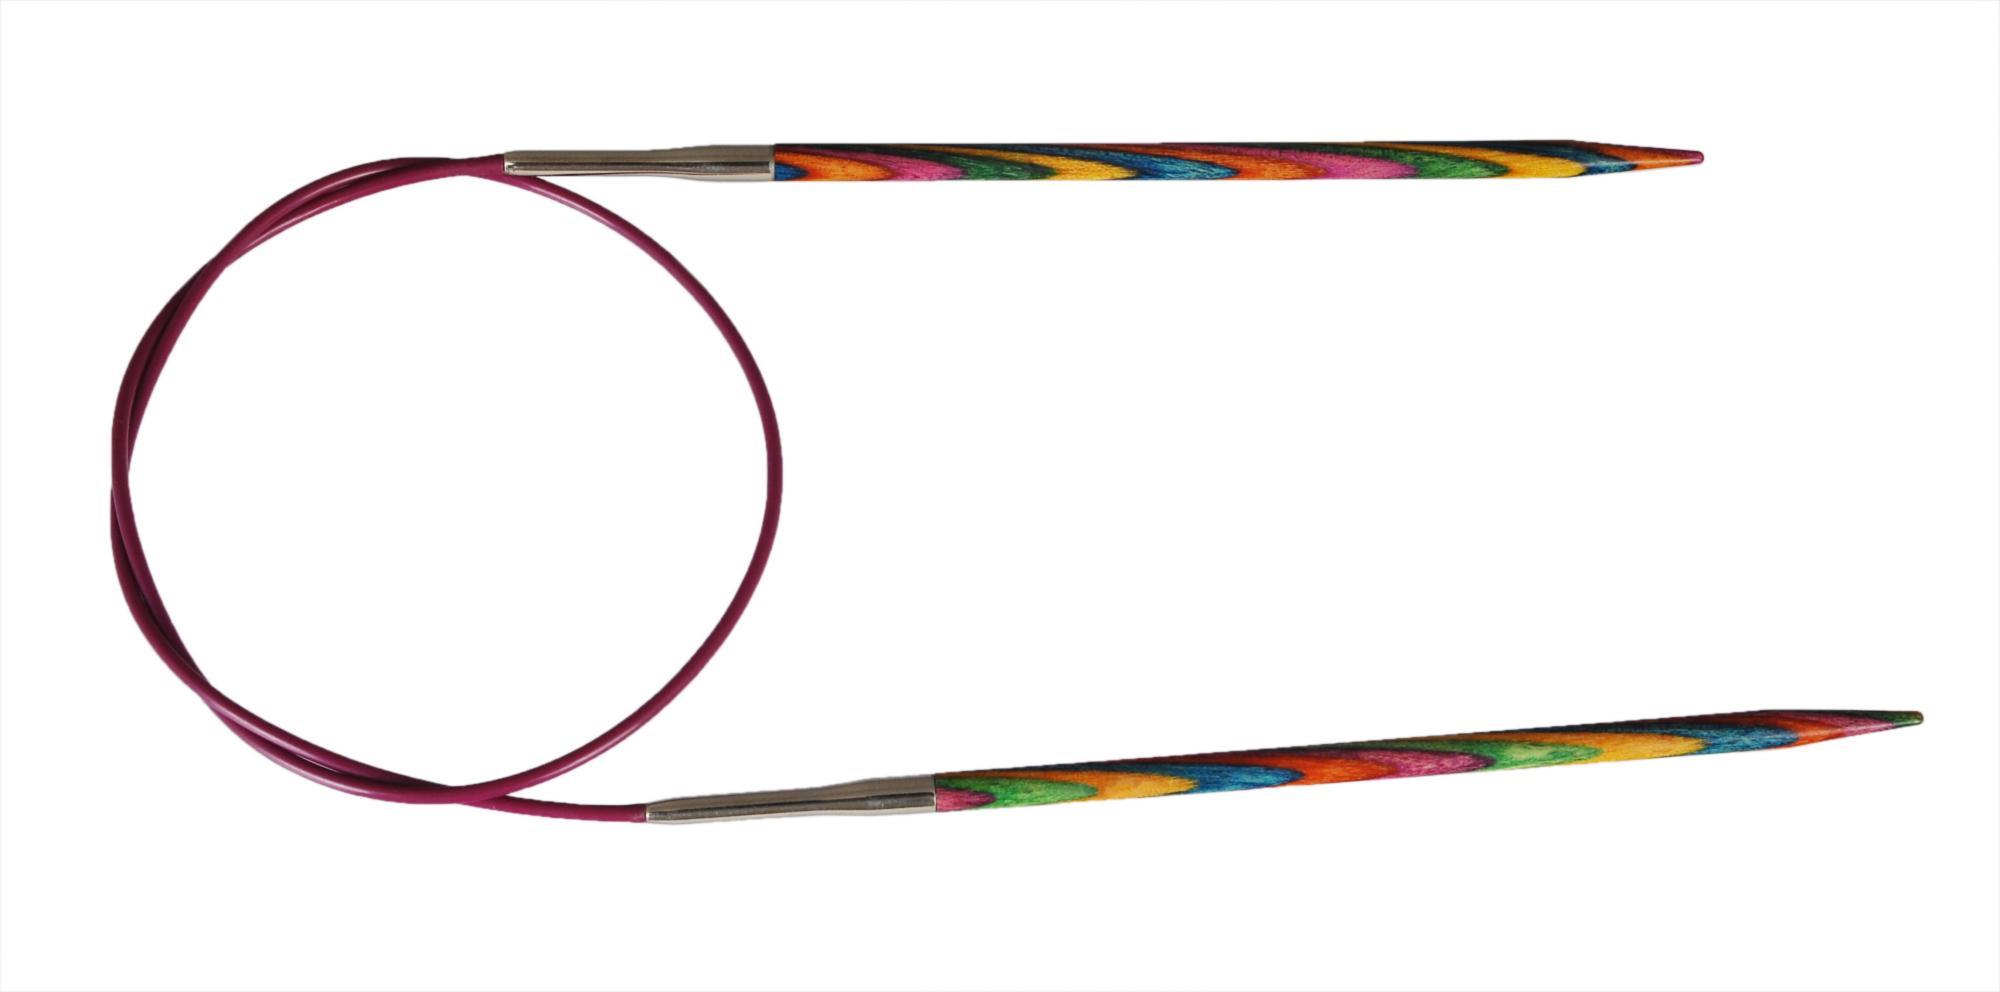 Спицы круговые 150 см Symfonie Wood KnitPro, 21390, 9.00 мм